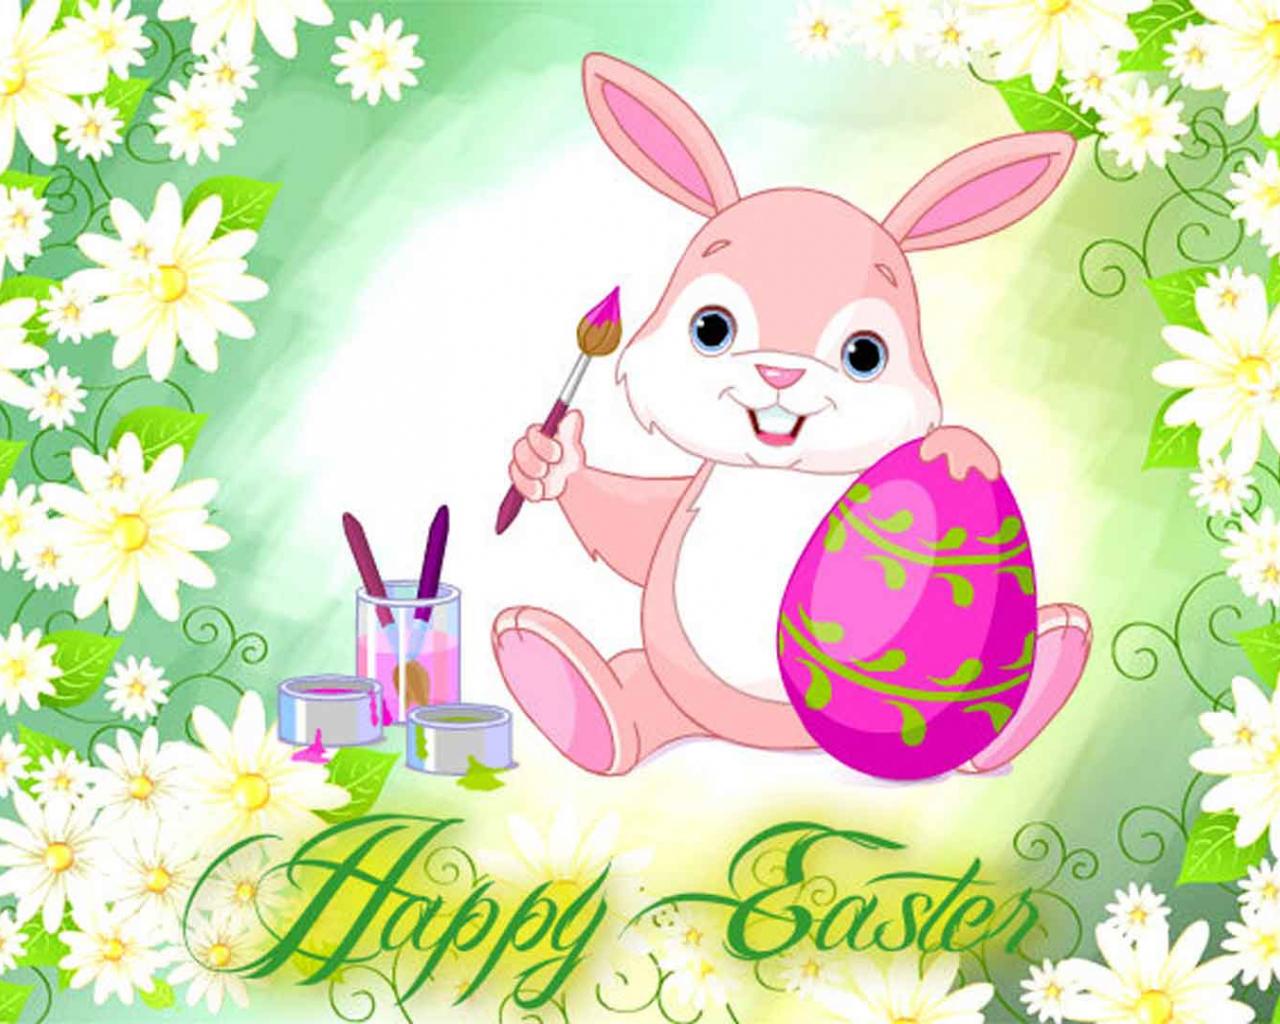 Free Download Pics Photos Cute Happy Easter Wallpaper Cute Happy